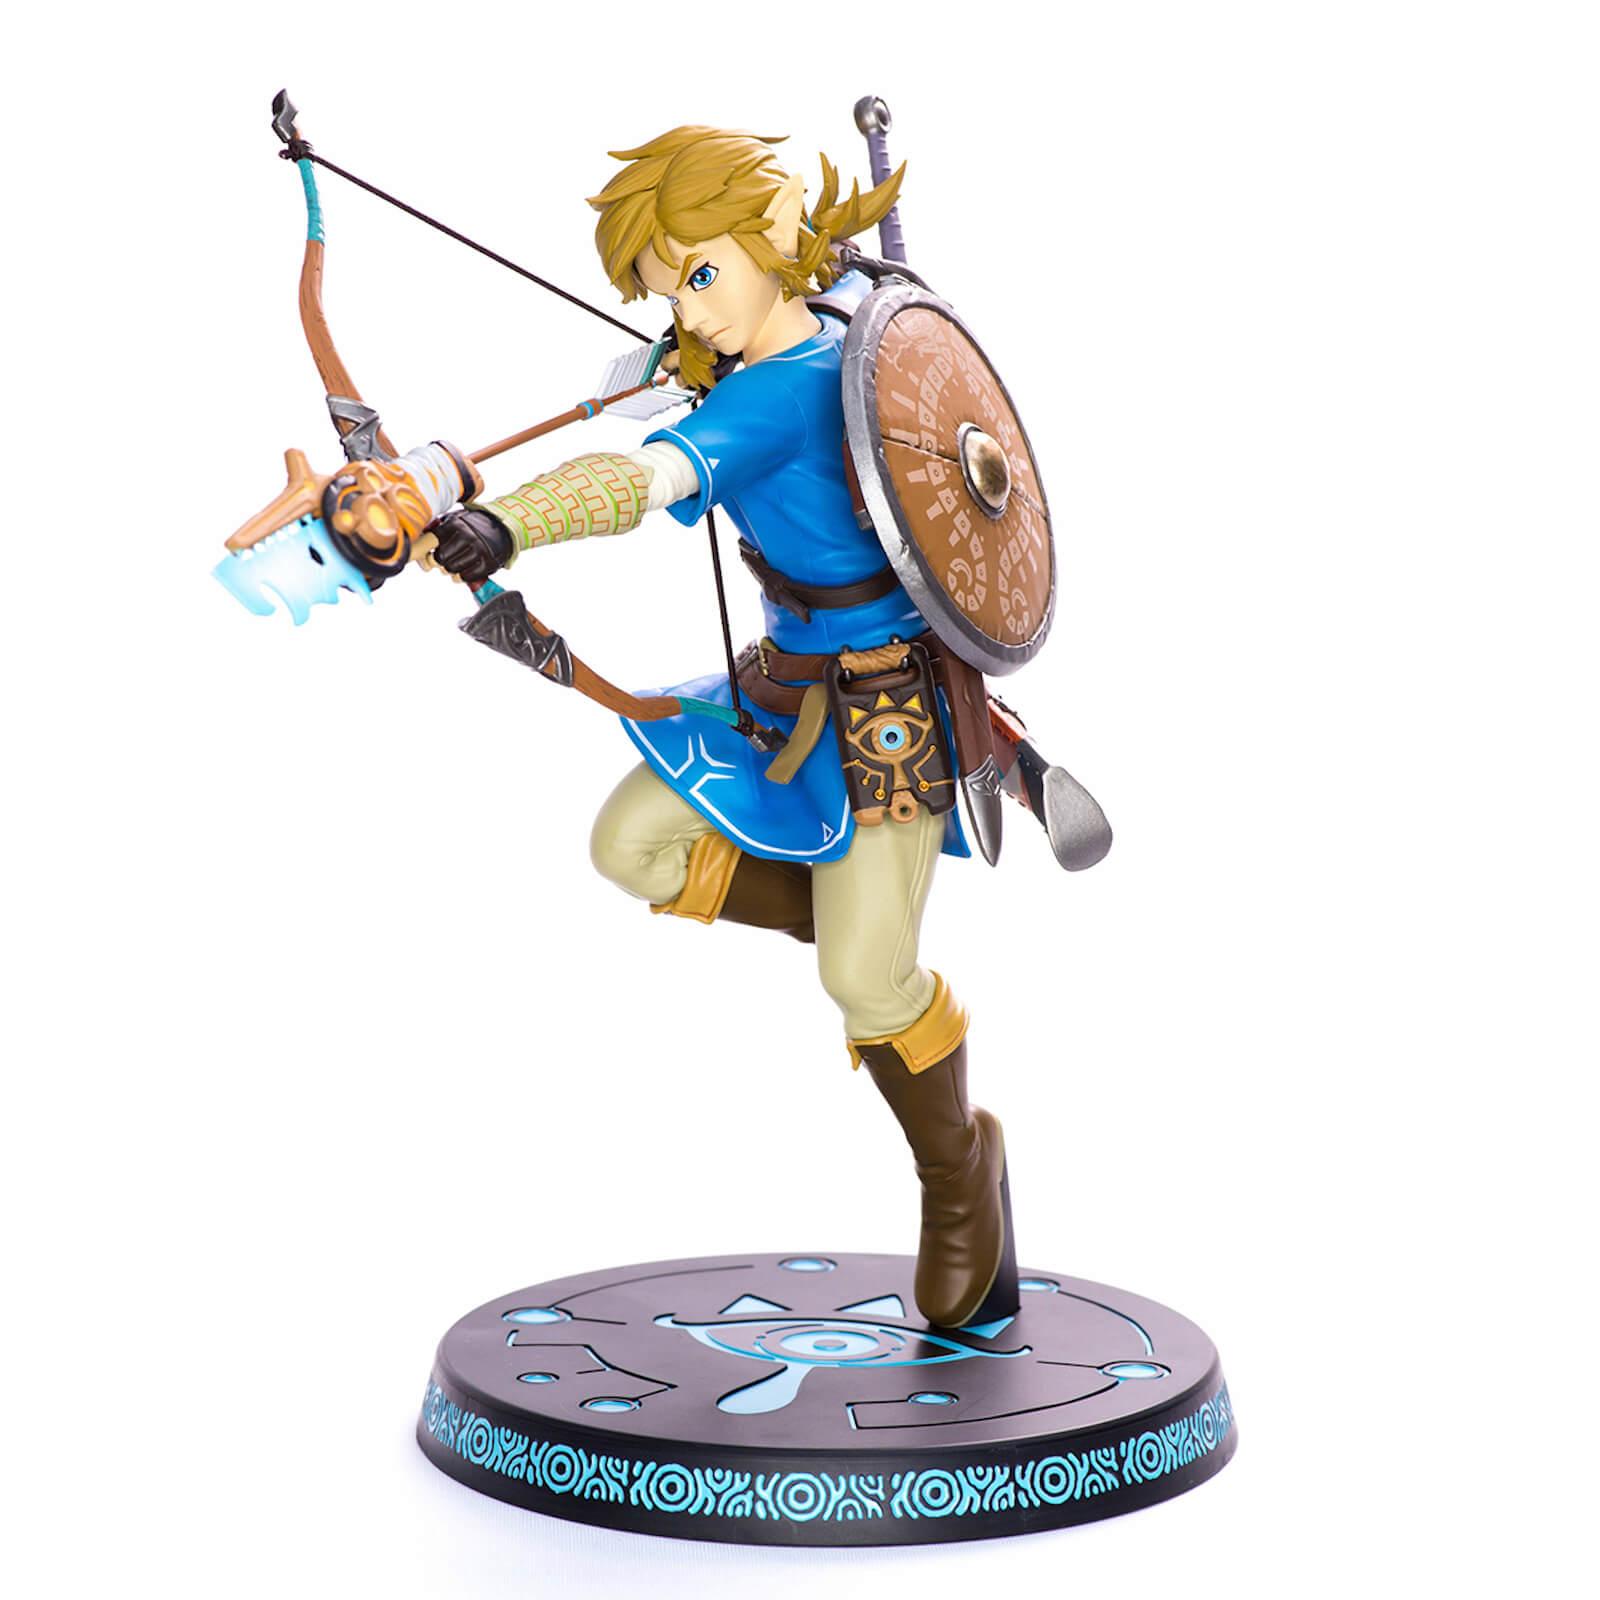 Image of First 4 Figures The Legend Of Zelda: Breath of the Wild 25cm PVC Figures - Link